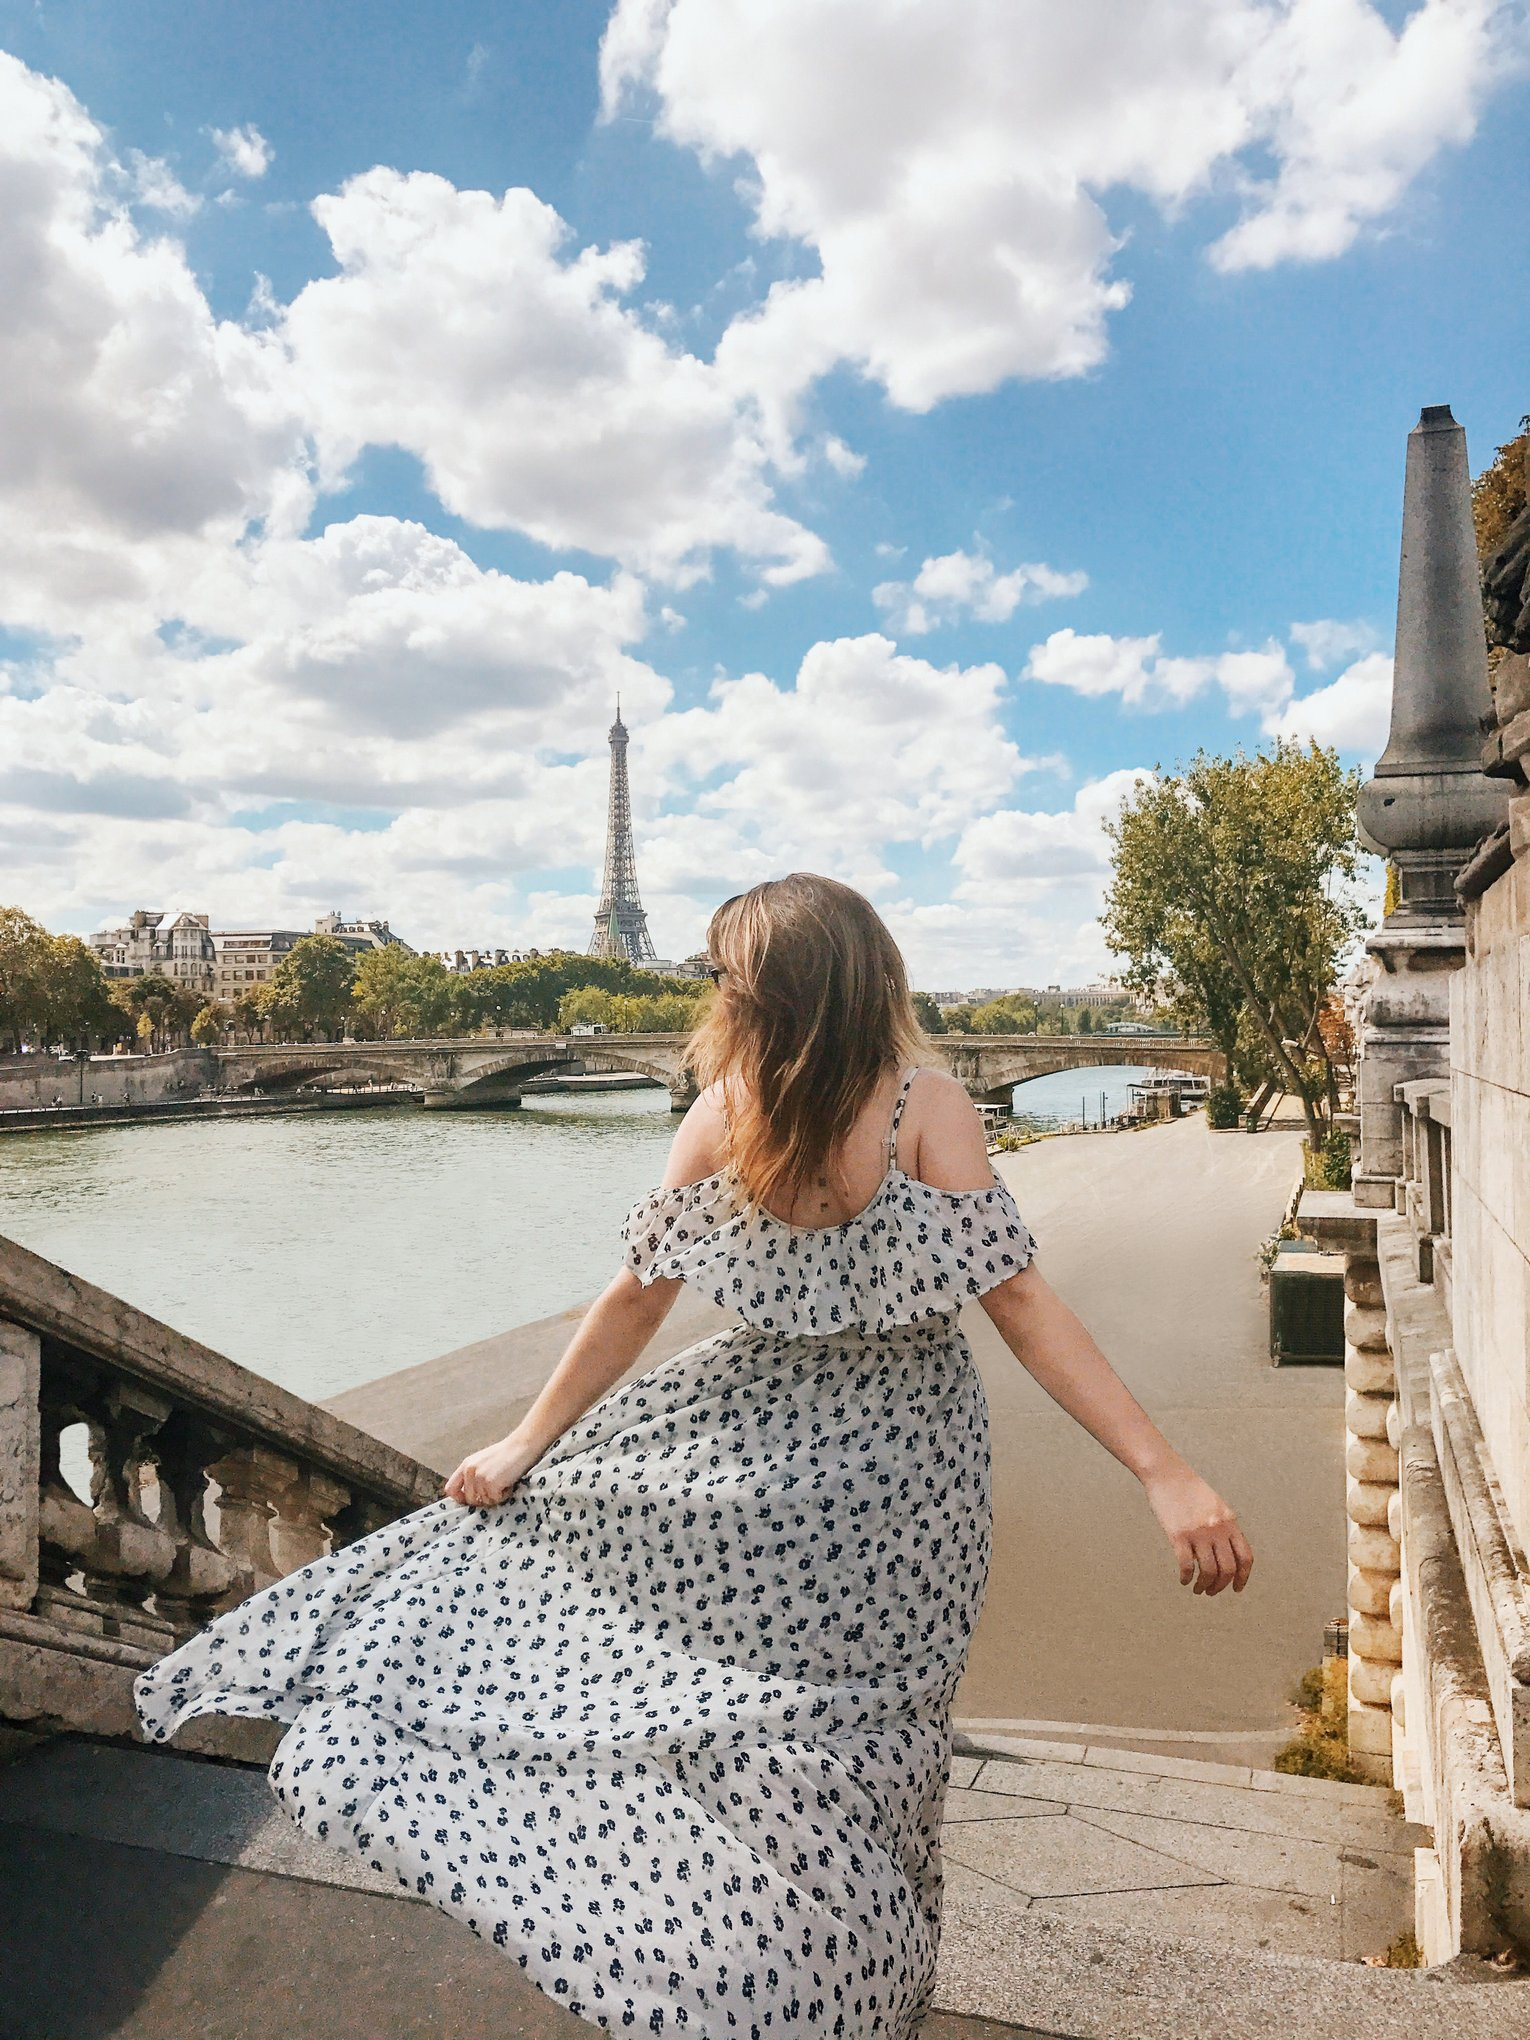 Lena_Mirisola_Paris_Munich_Europe_113.JPG